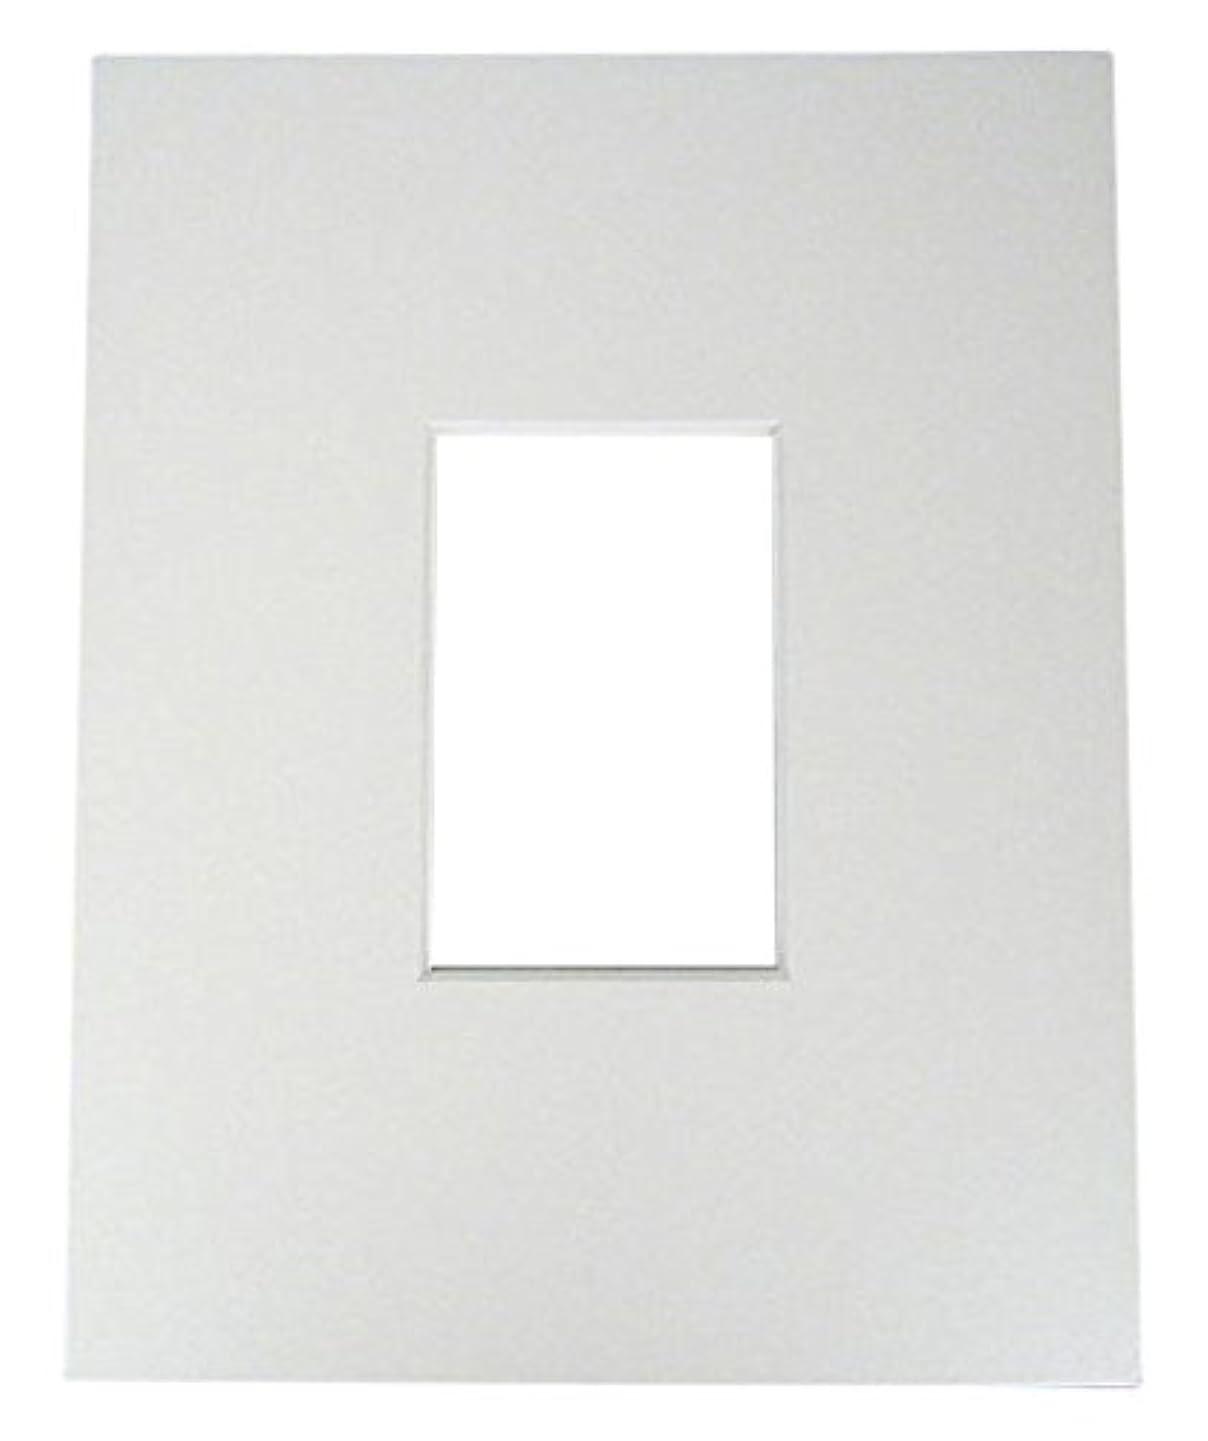 20 11x14 4-ply Mat White for 4x6 Photo + Backing + Bags jjubafatmhtm